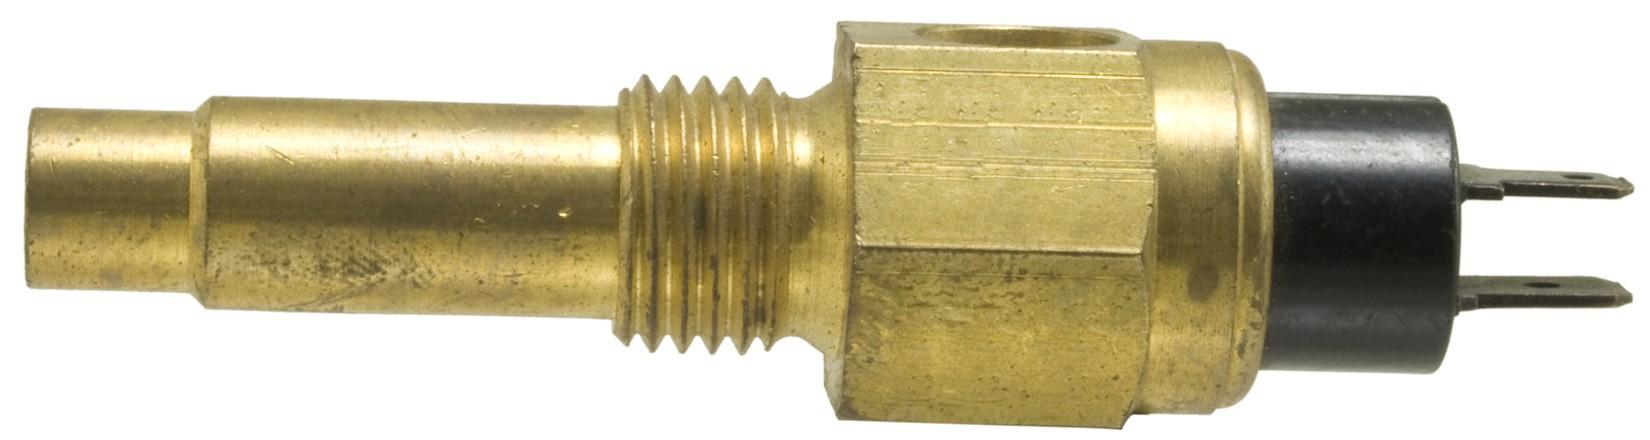 M14 1 5 Well For Temp Probe : Engine coolant temperature sensor wells su fits